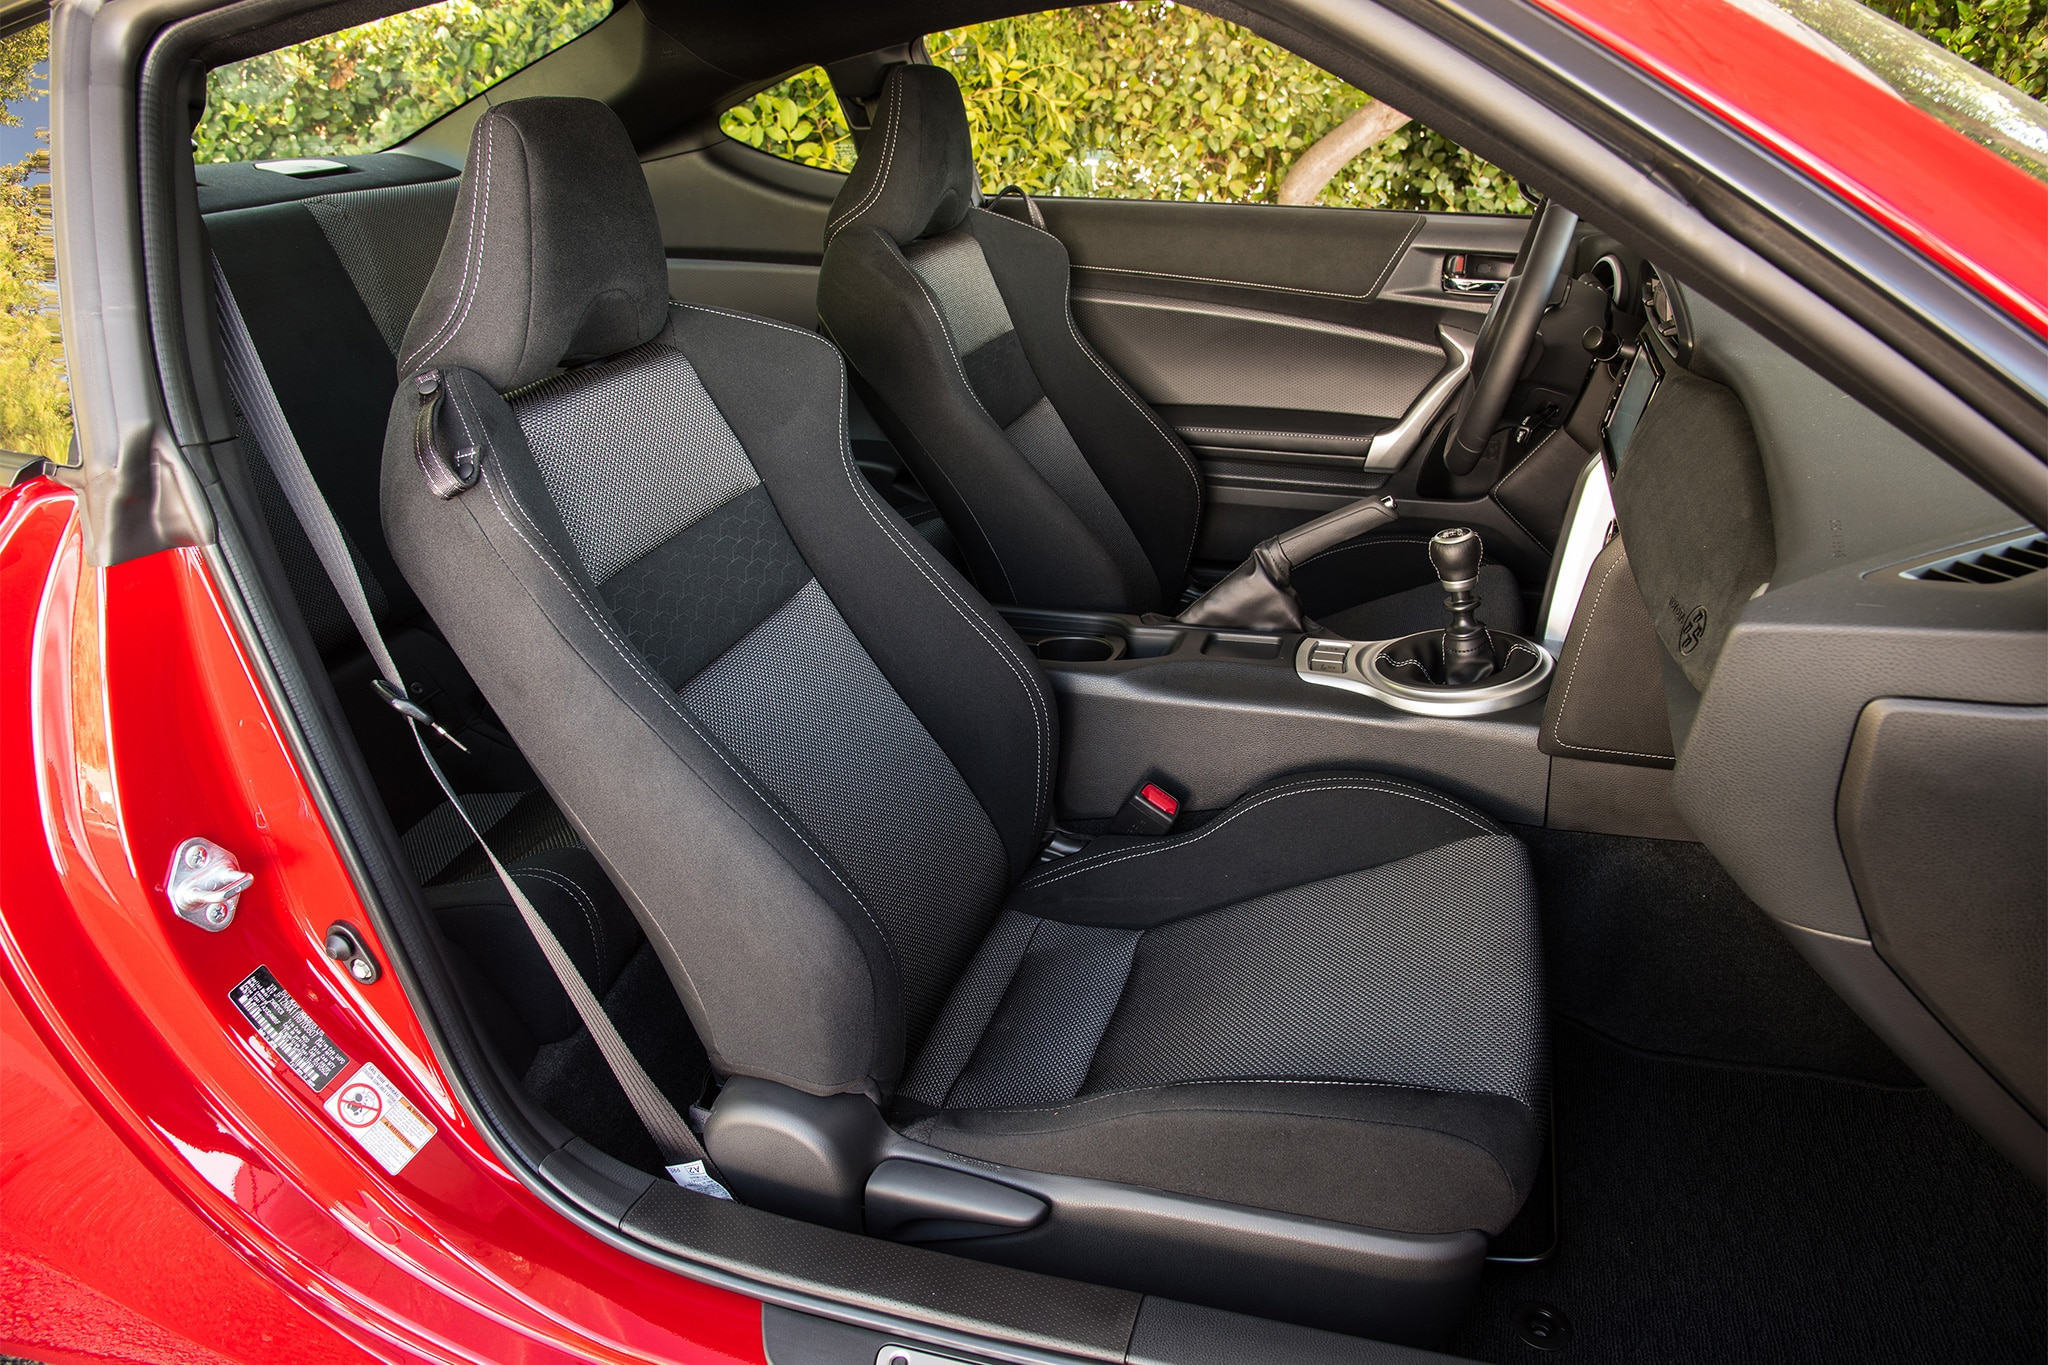 2017 Toyota 86 seats